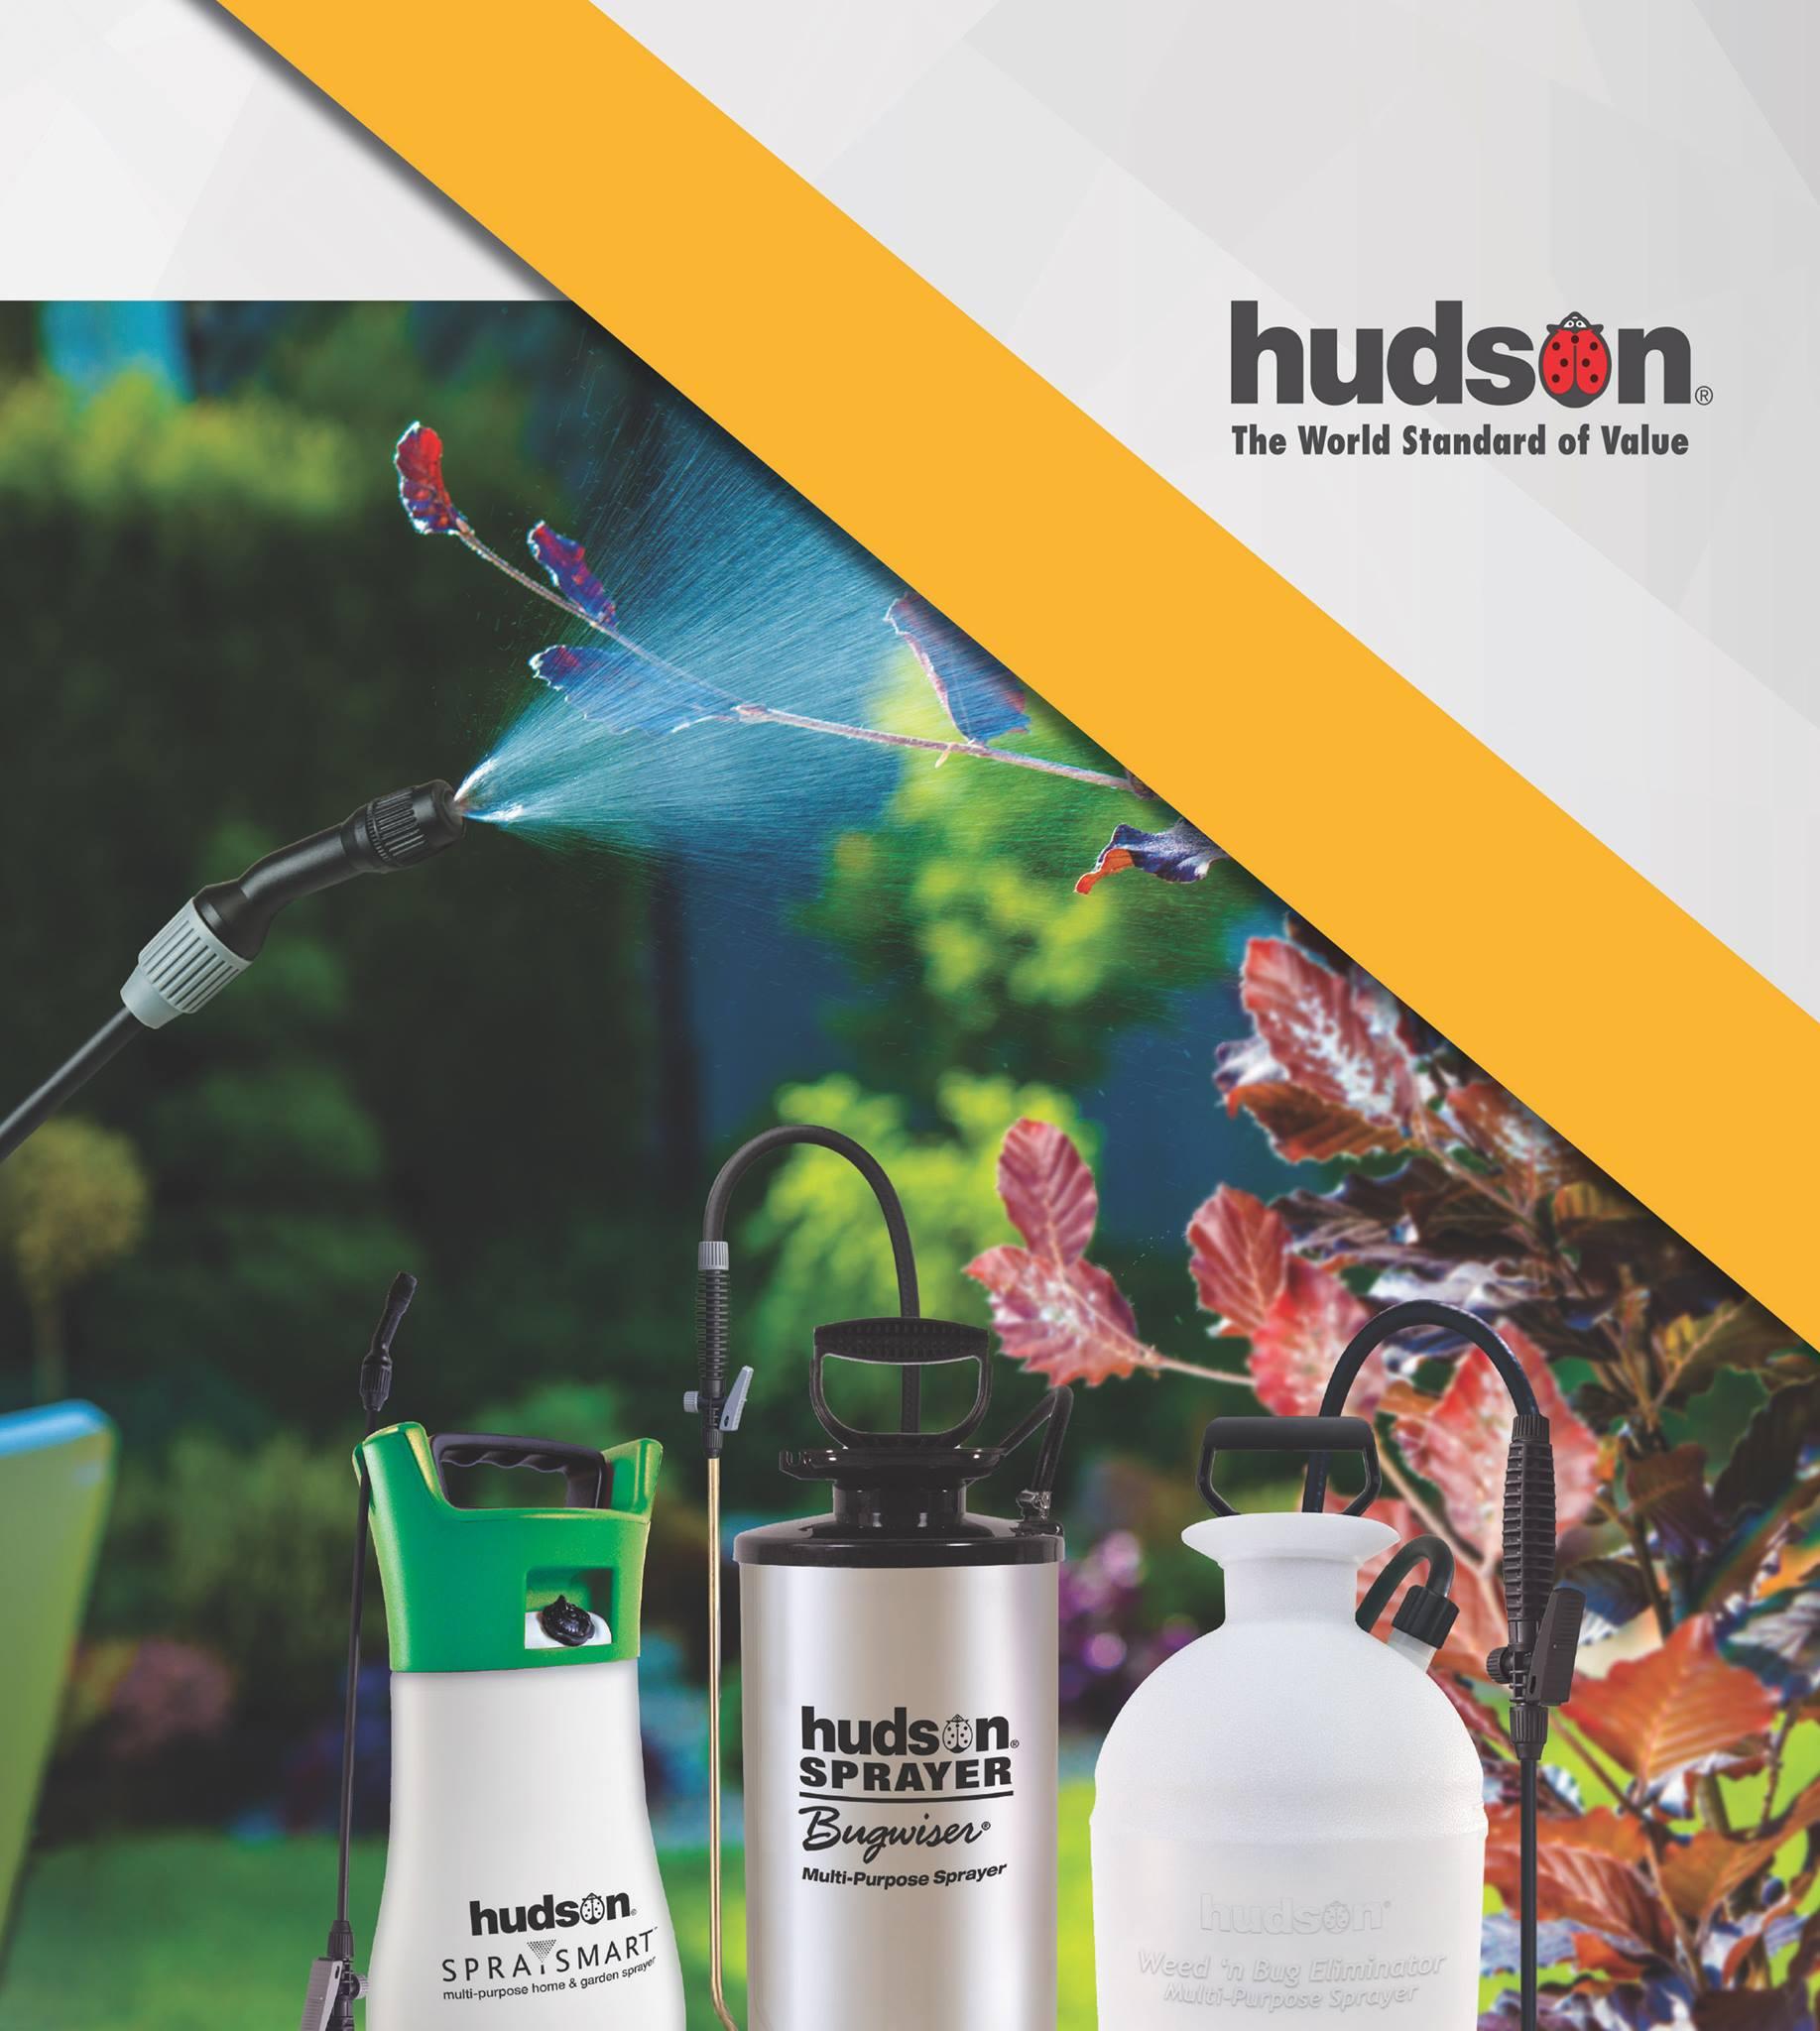 Superbe H.D. Hudson Sprayers | The Right Way To Spray